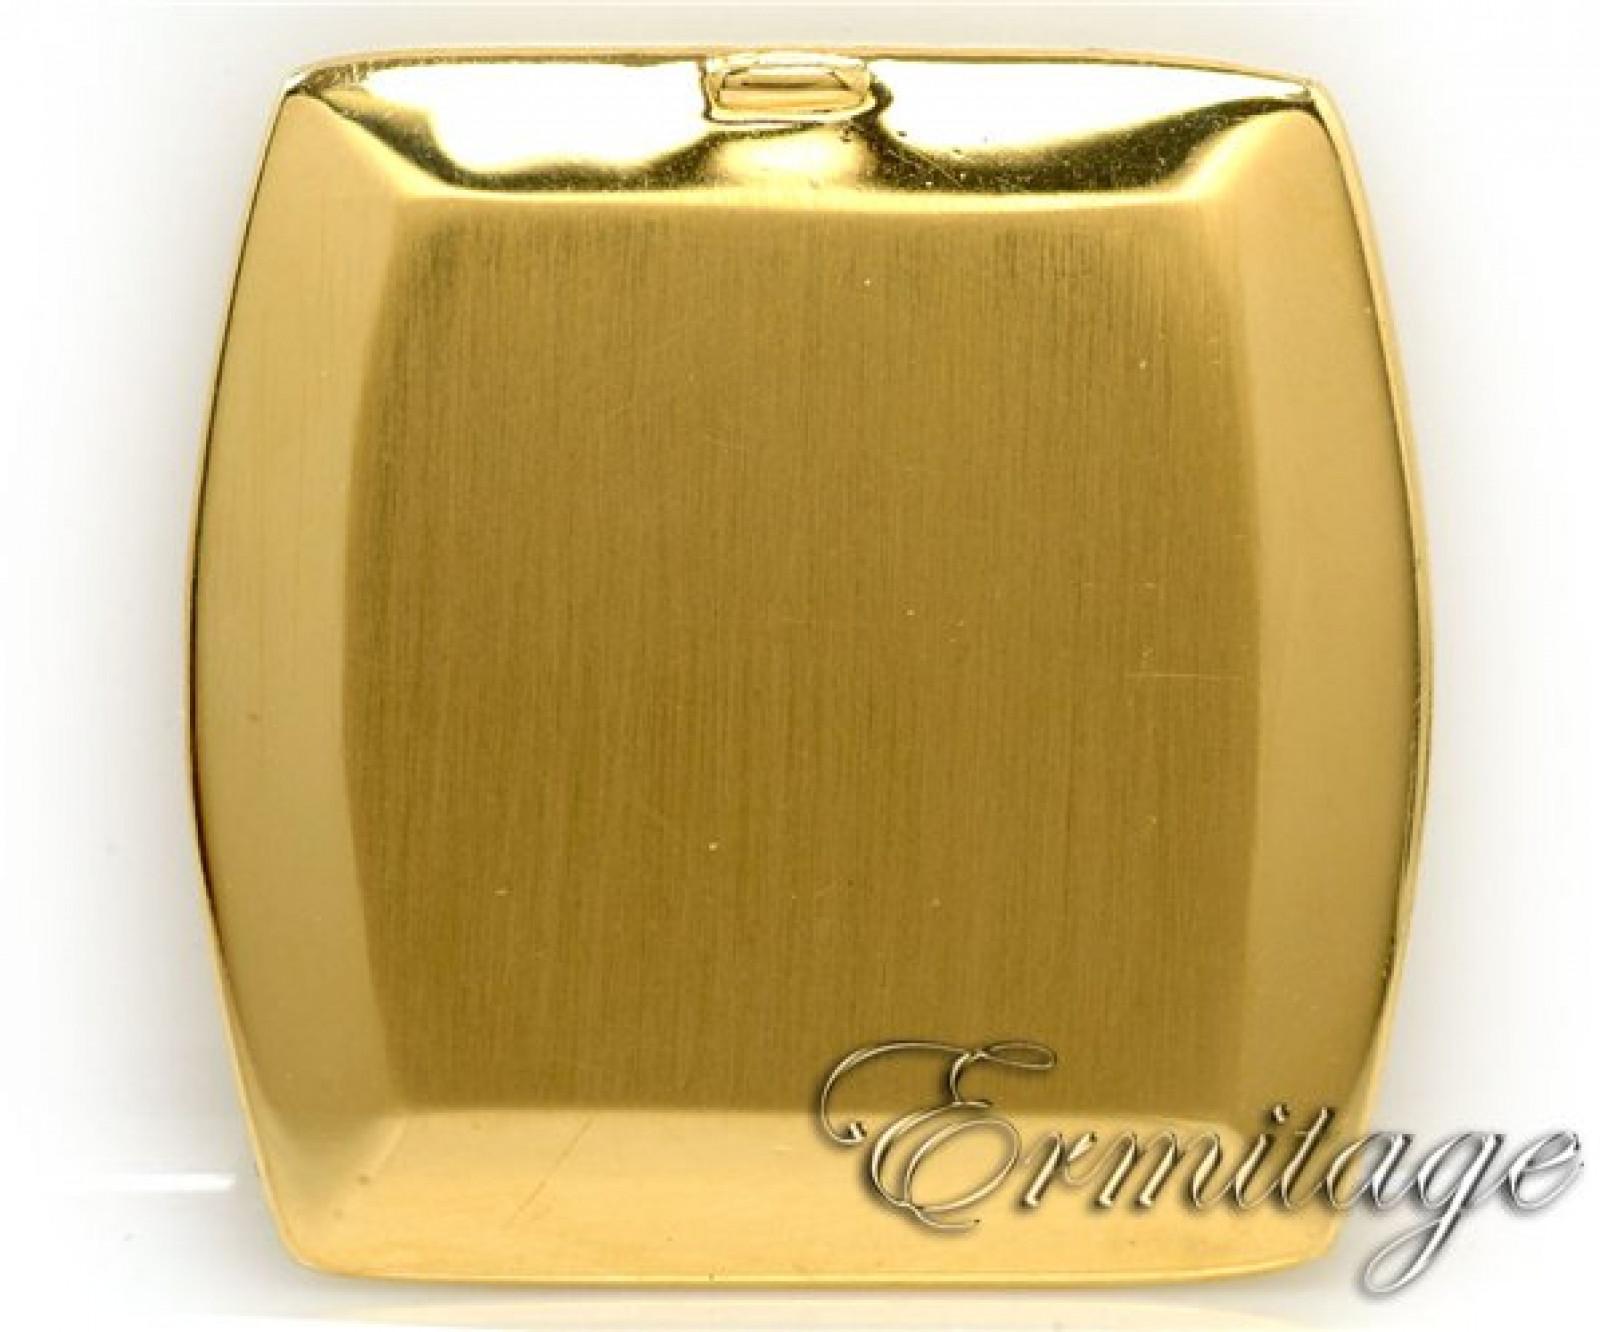 Vintage Rolex Geneva 3604 Gold